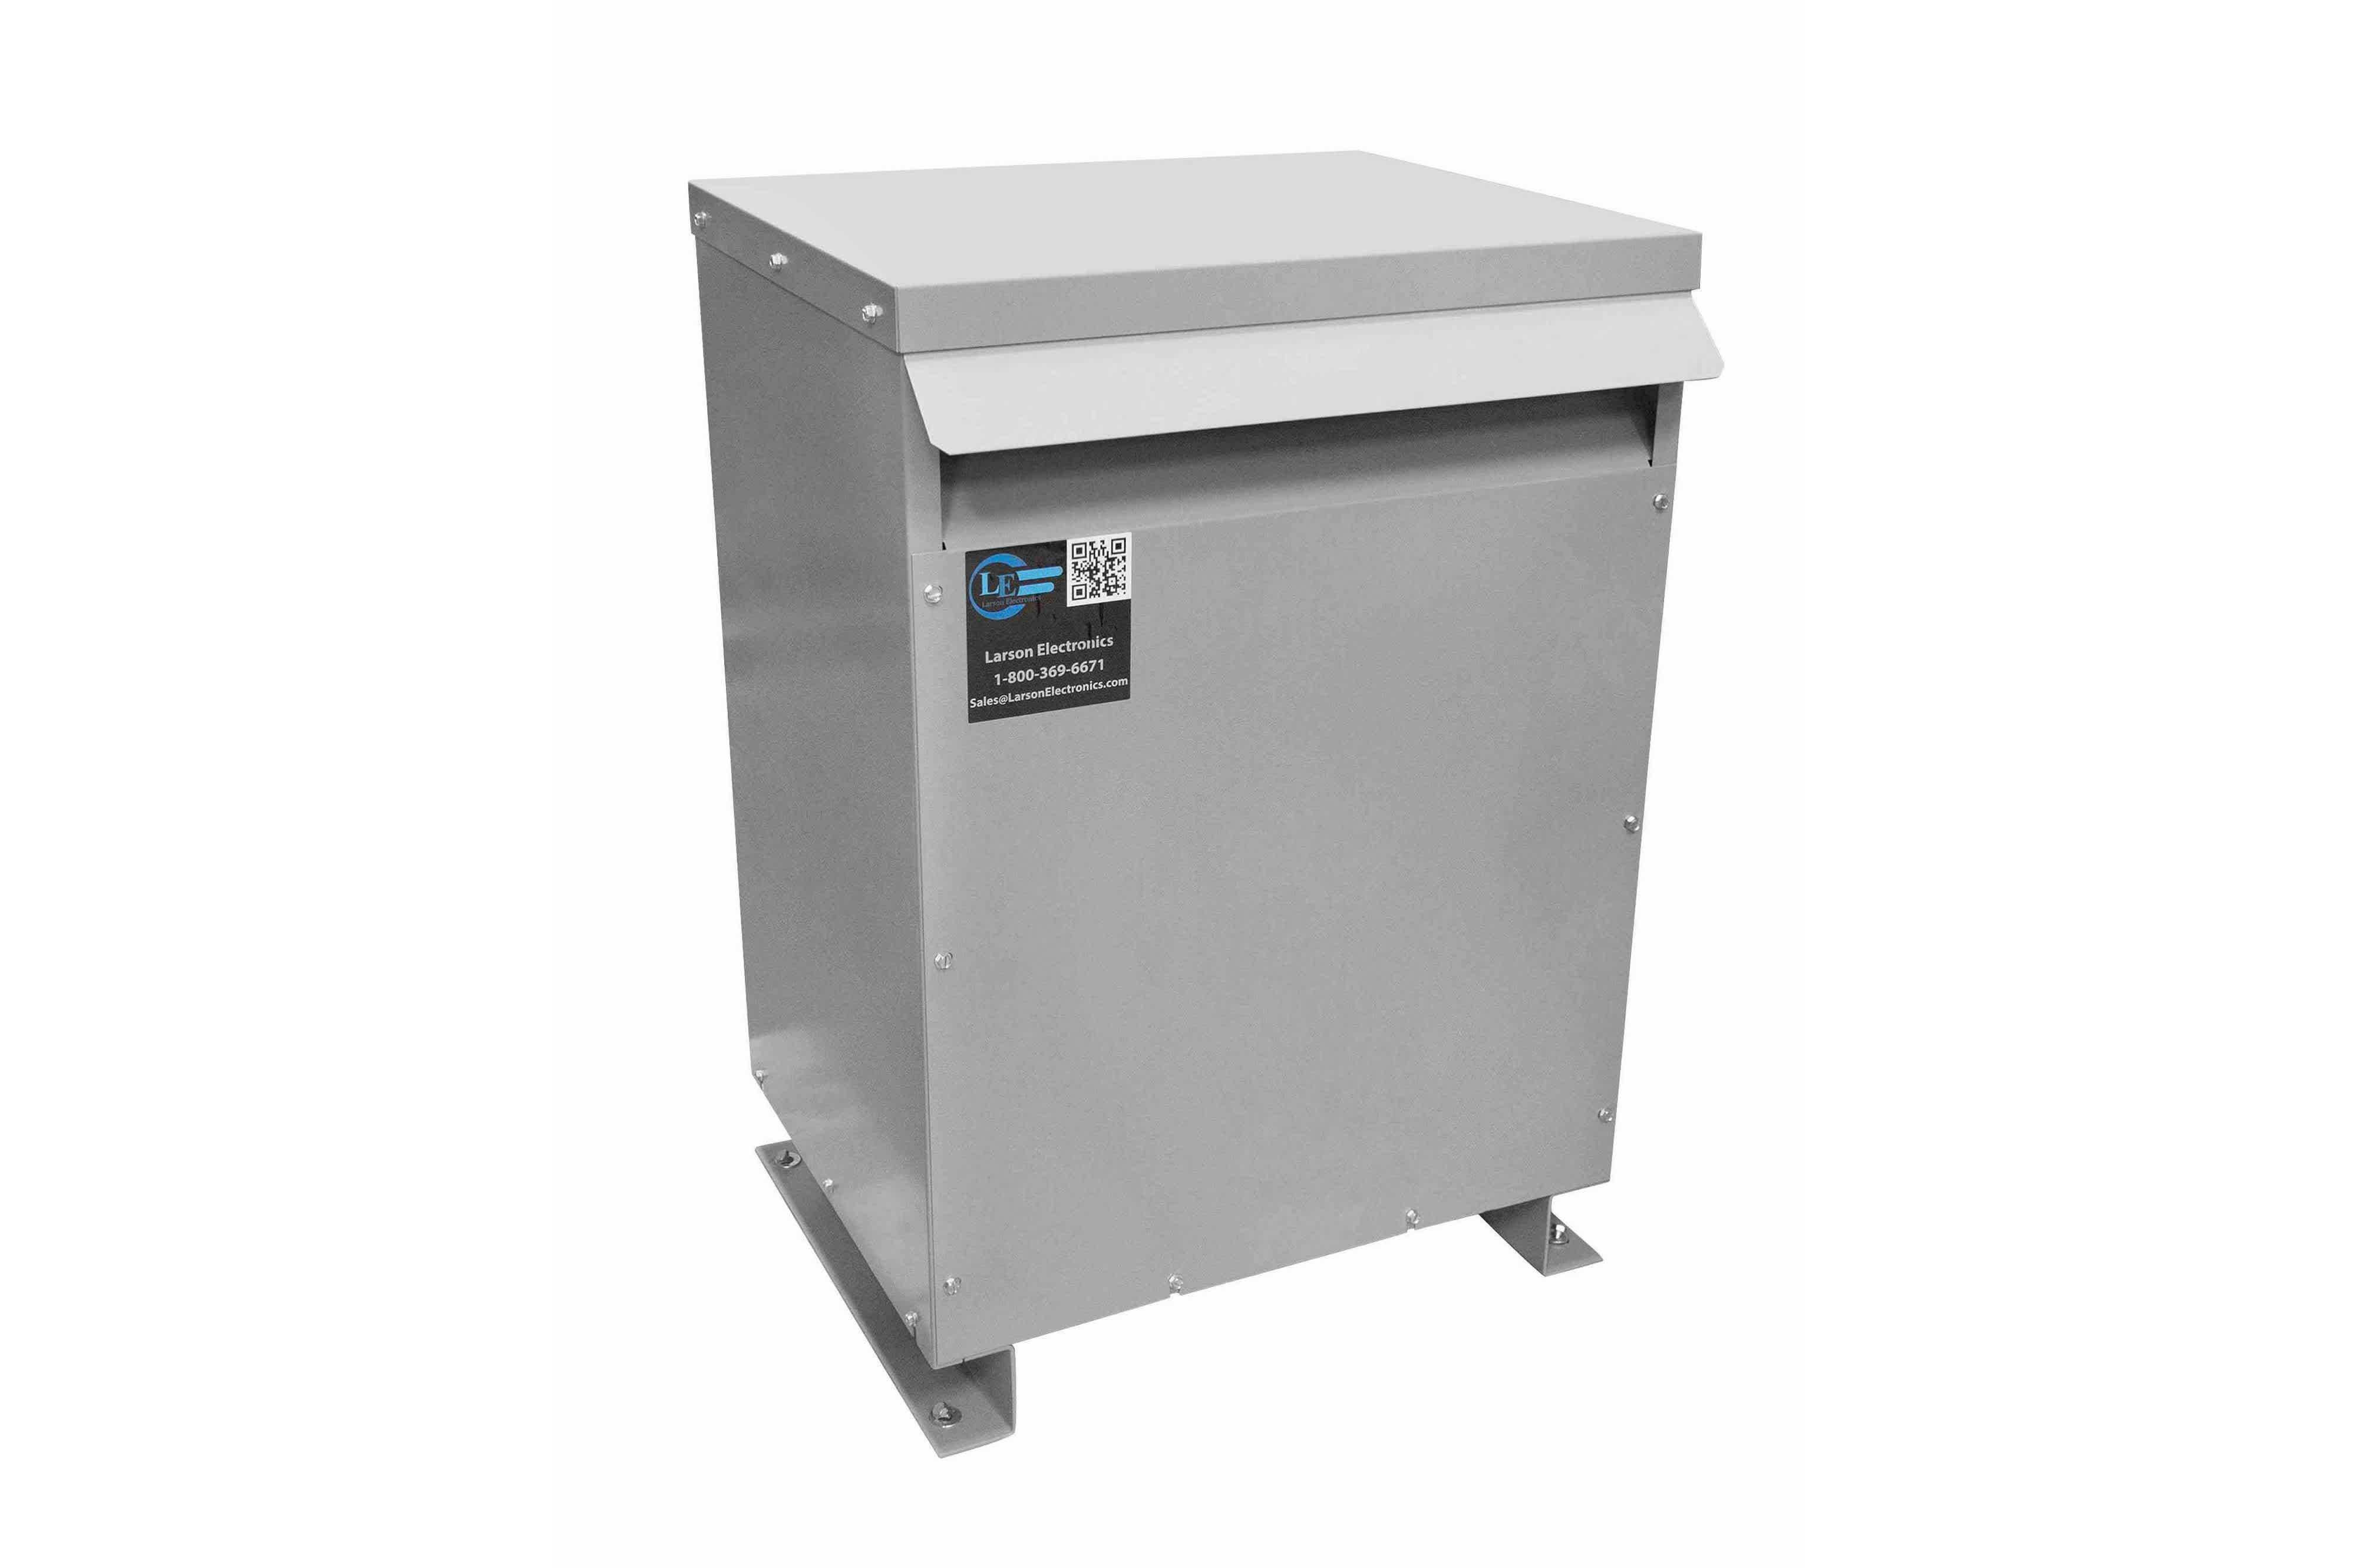 800 kVA 3PH Isolation Transformer, 575V Wye Primary, 380Y/220 Wye-N Secondary, N3R, Ventilated, 60 Hz